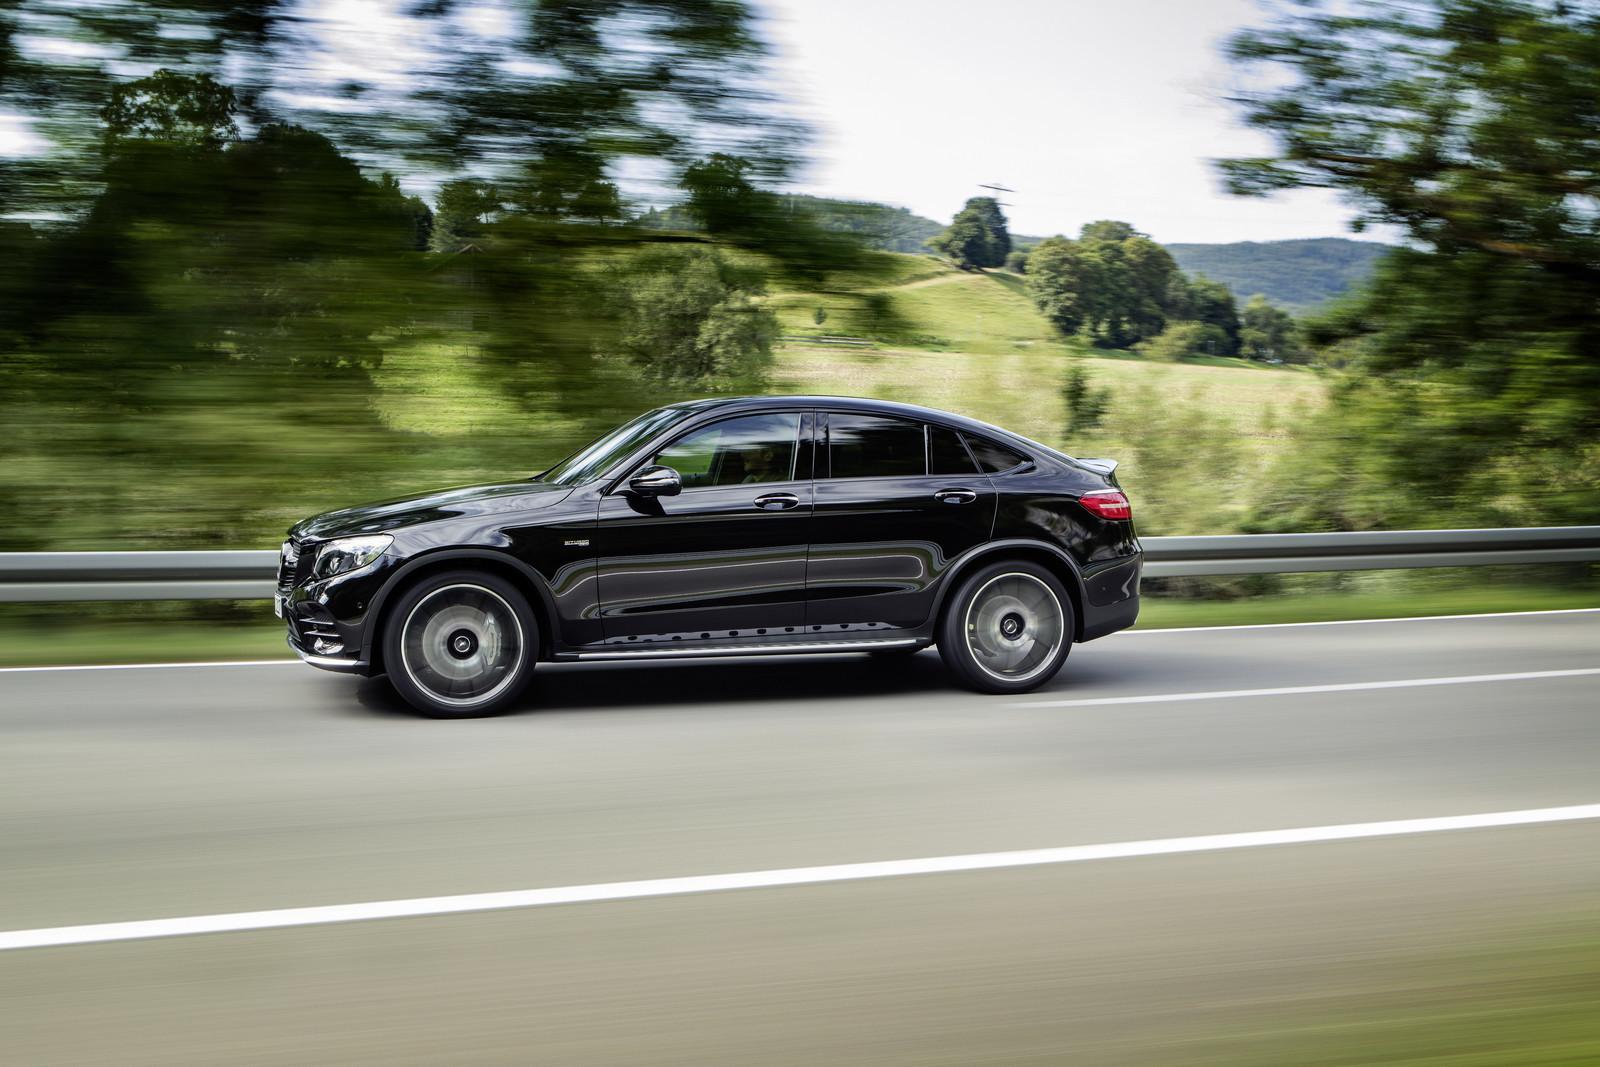 Foto de Mercedes-AMG GLC 43 4MATIC Coupé (5/24)